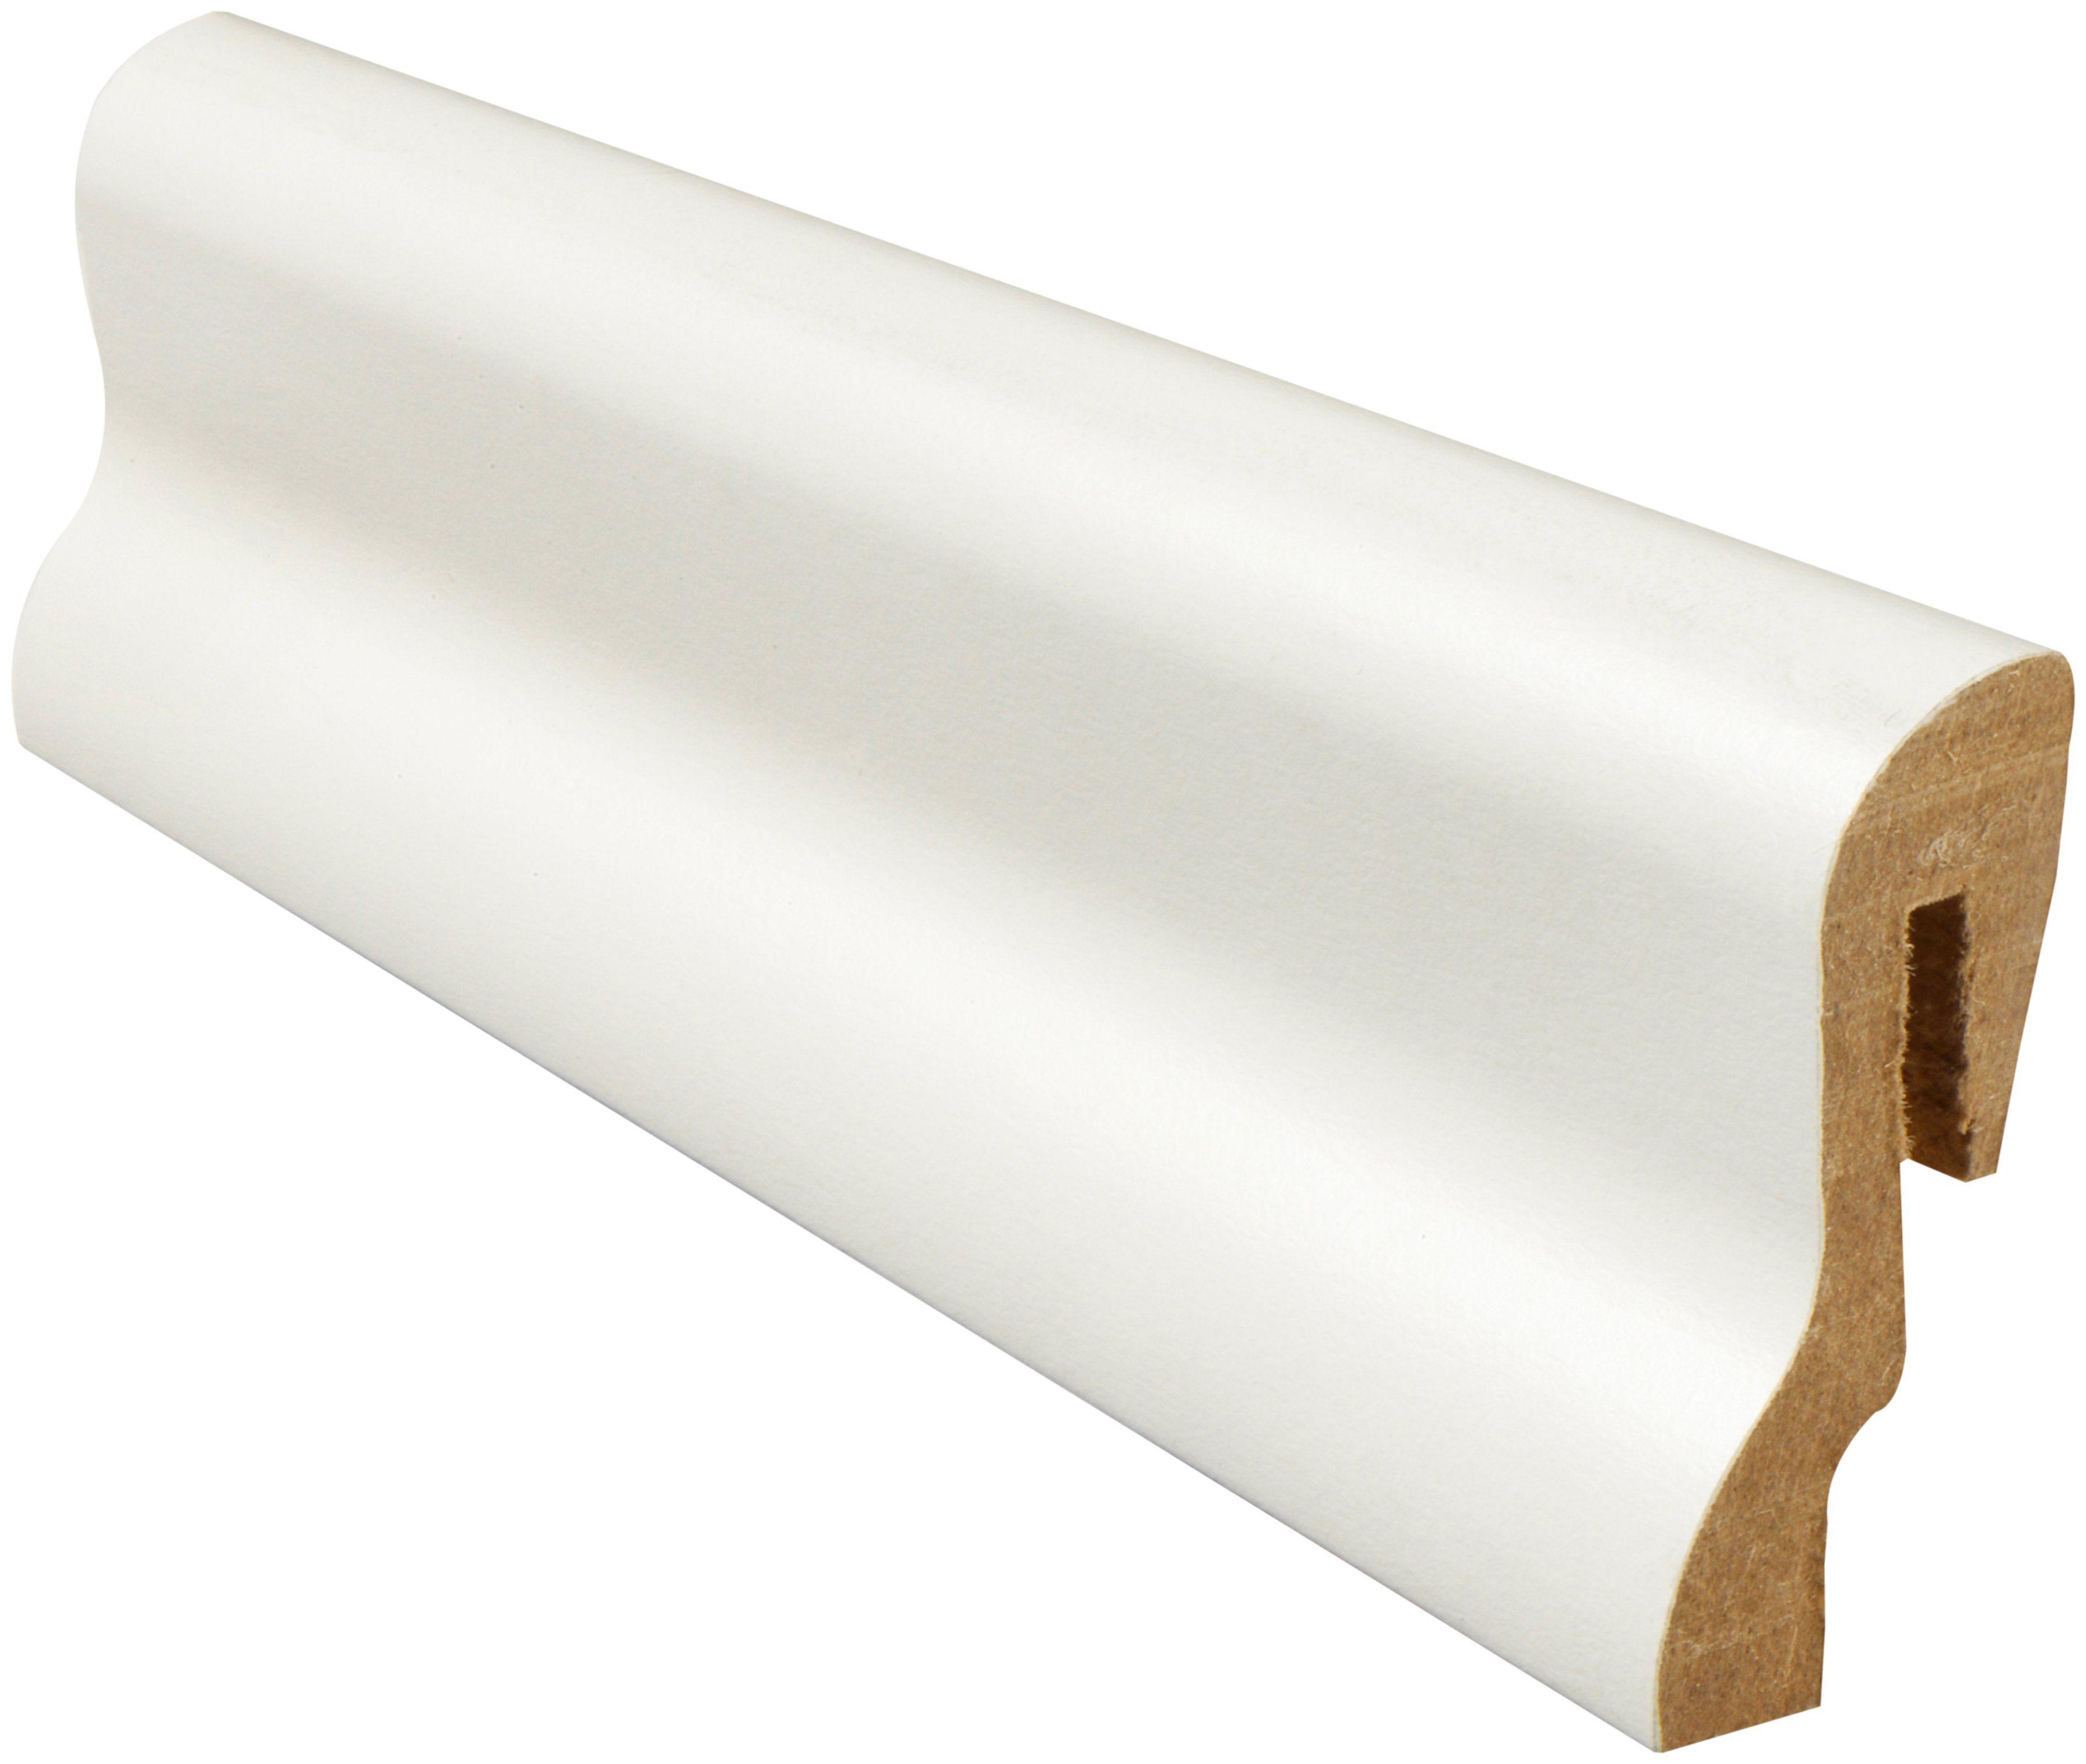 MODERNA Sockelleiste »Sockelleiste SL 40 - weiß«, 1 Stk., Höhe: 4 cm